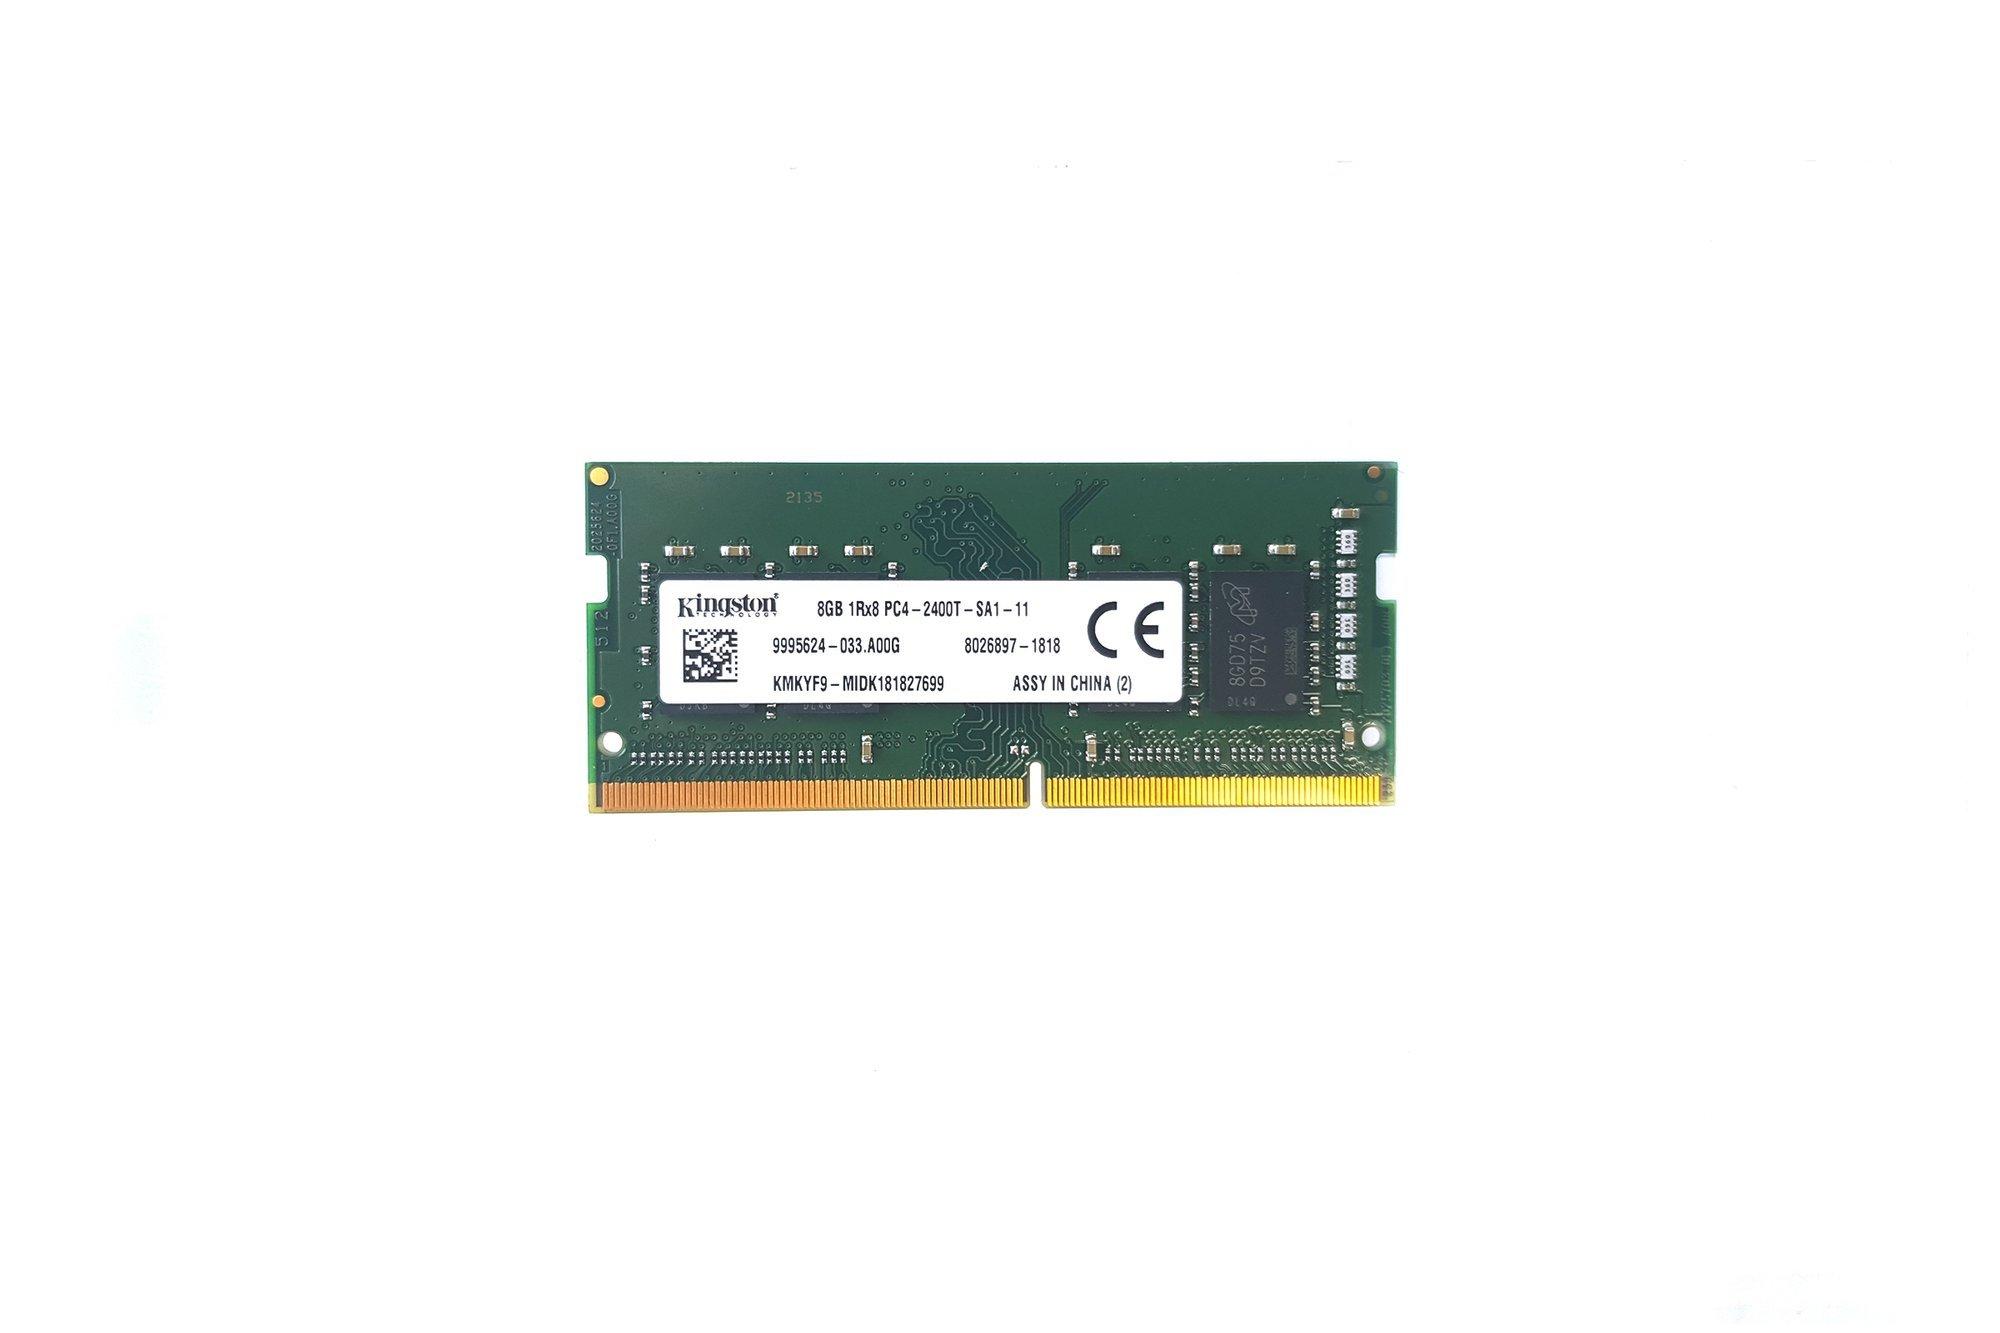 SODIMM Memory RAM Kingston 8GB DDR4 KMKYF9-MIB